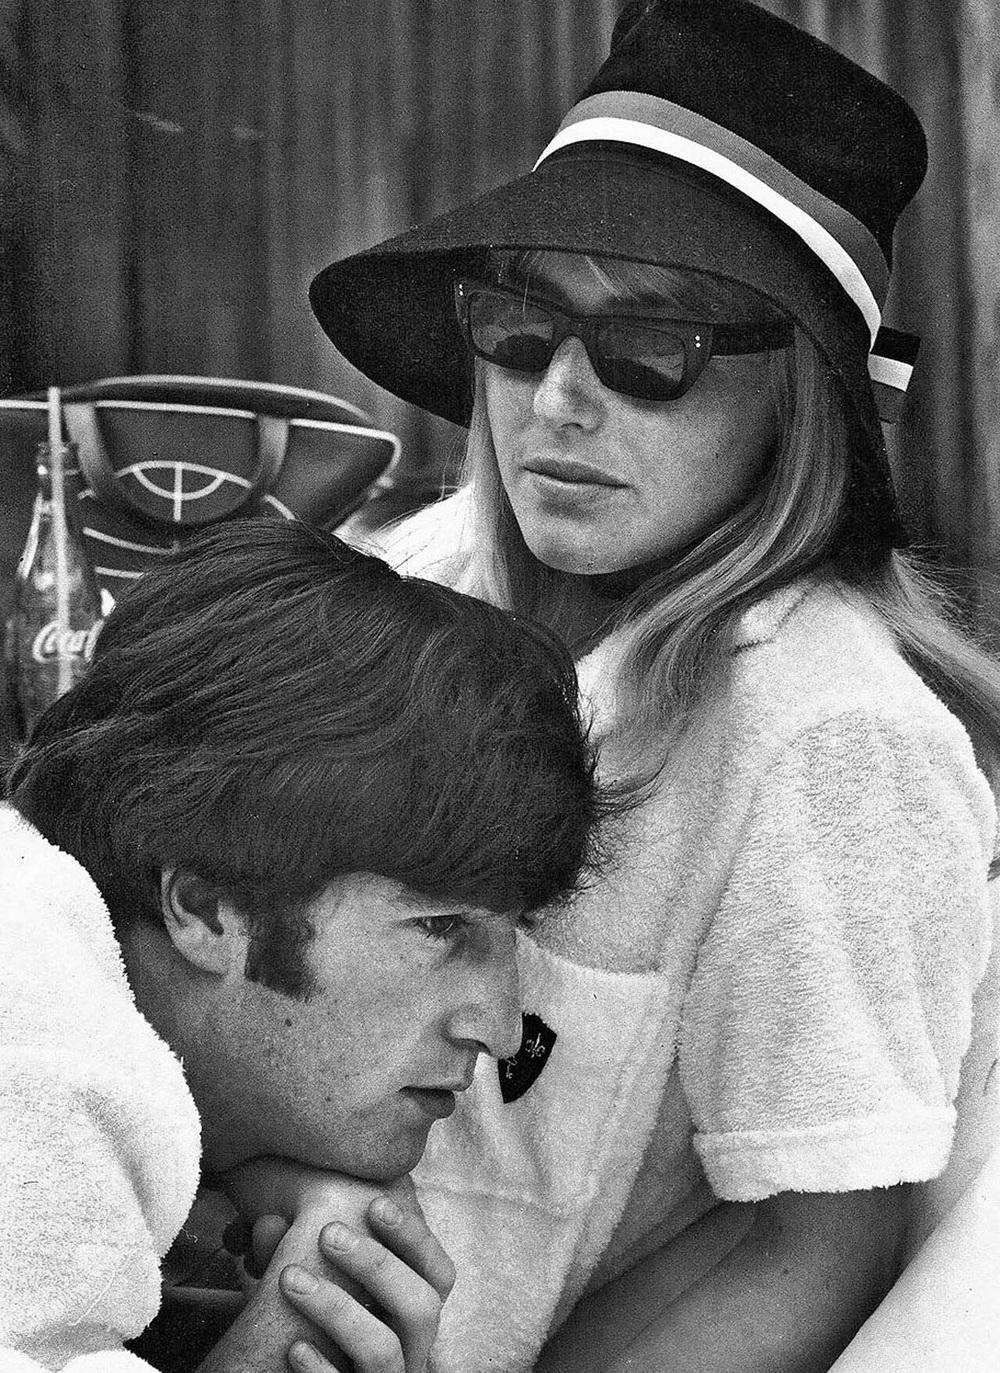 John and Cynthia Lennon, 1964.